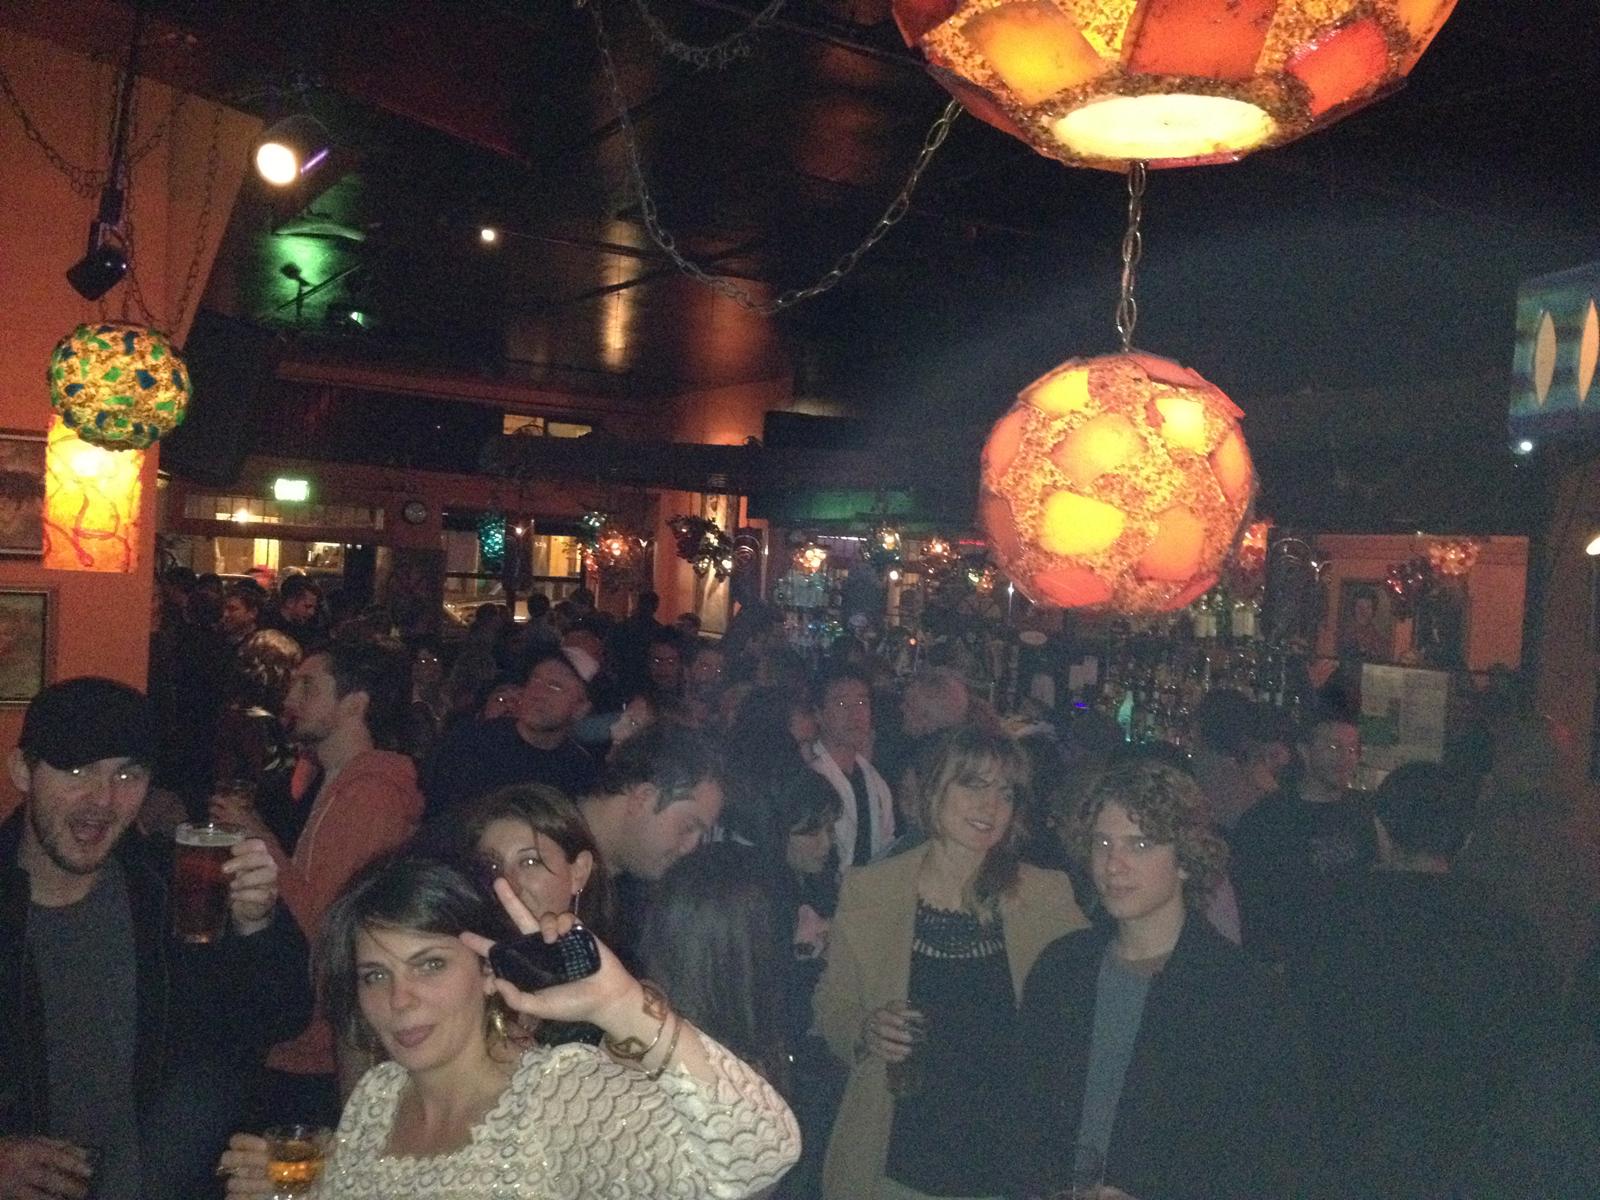 Maximum Capacity Means Nada at Popular Bars